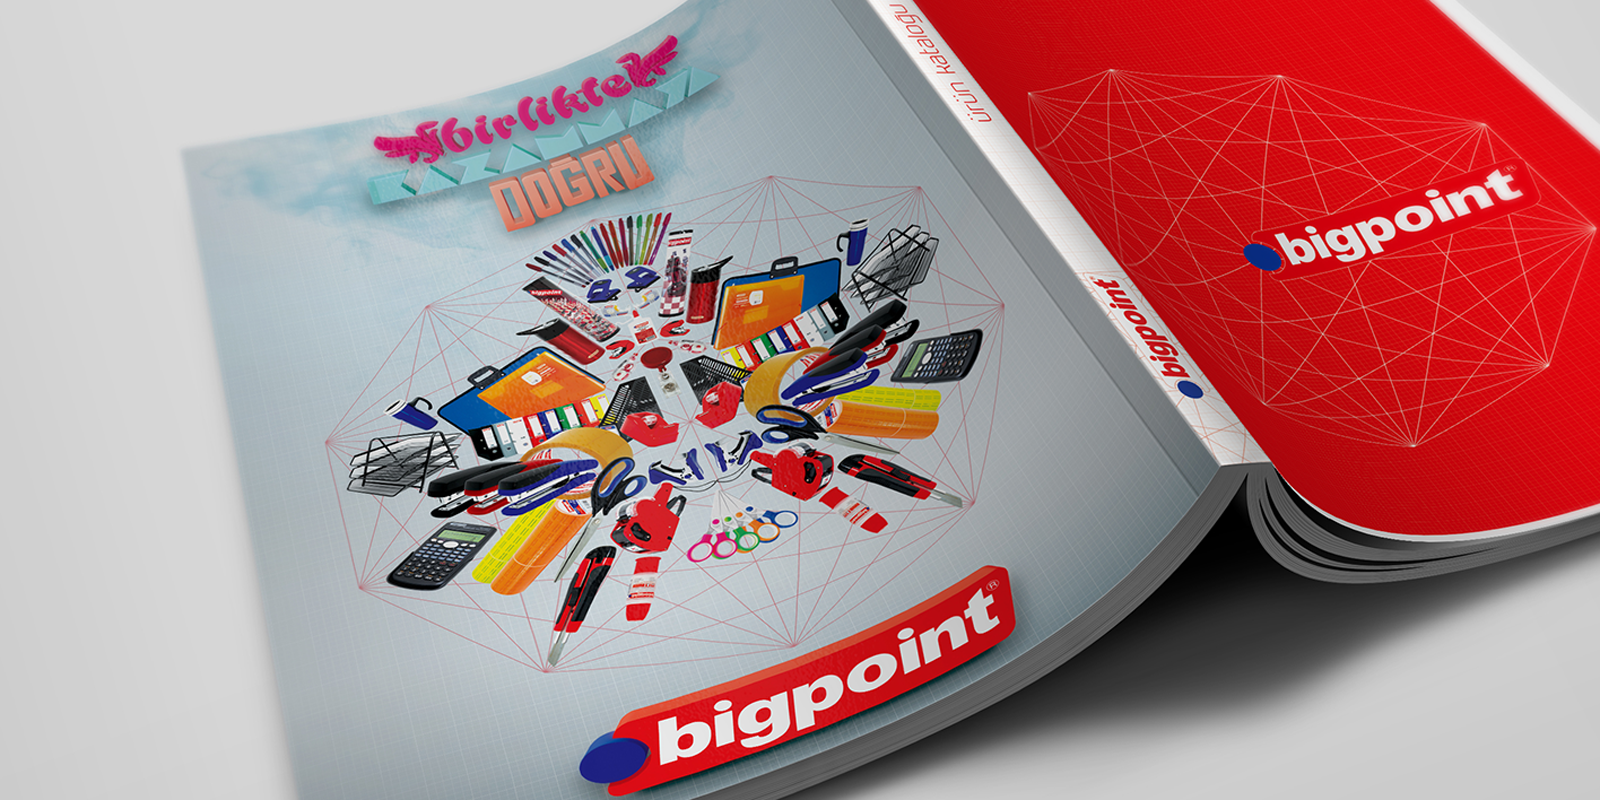 Bigpoint 2